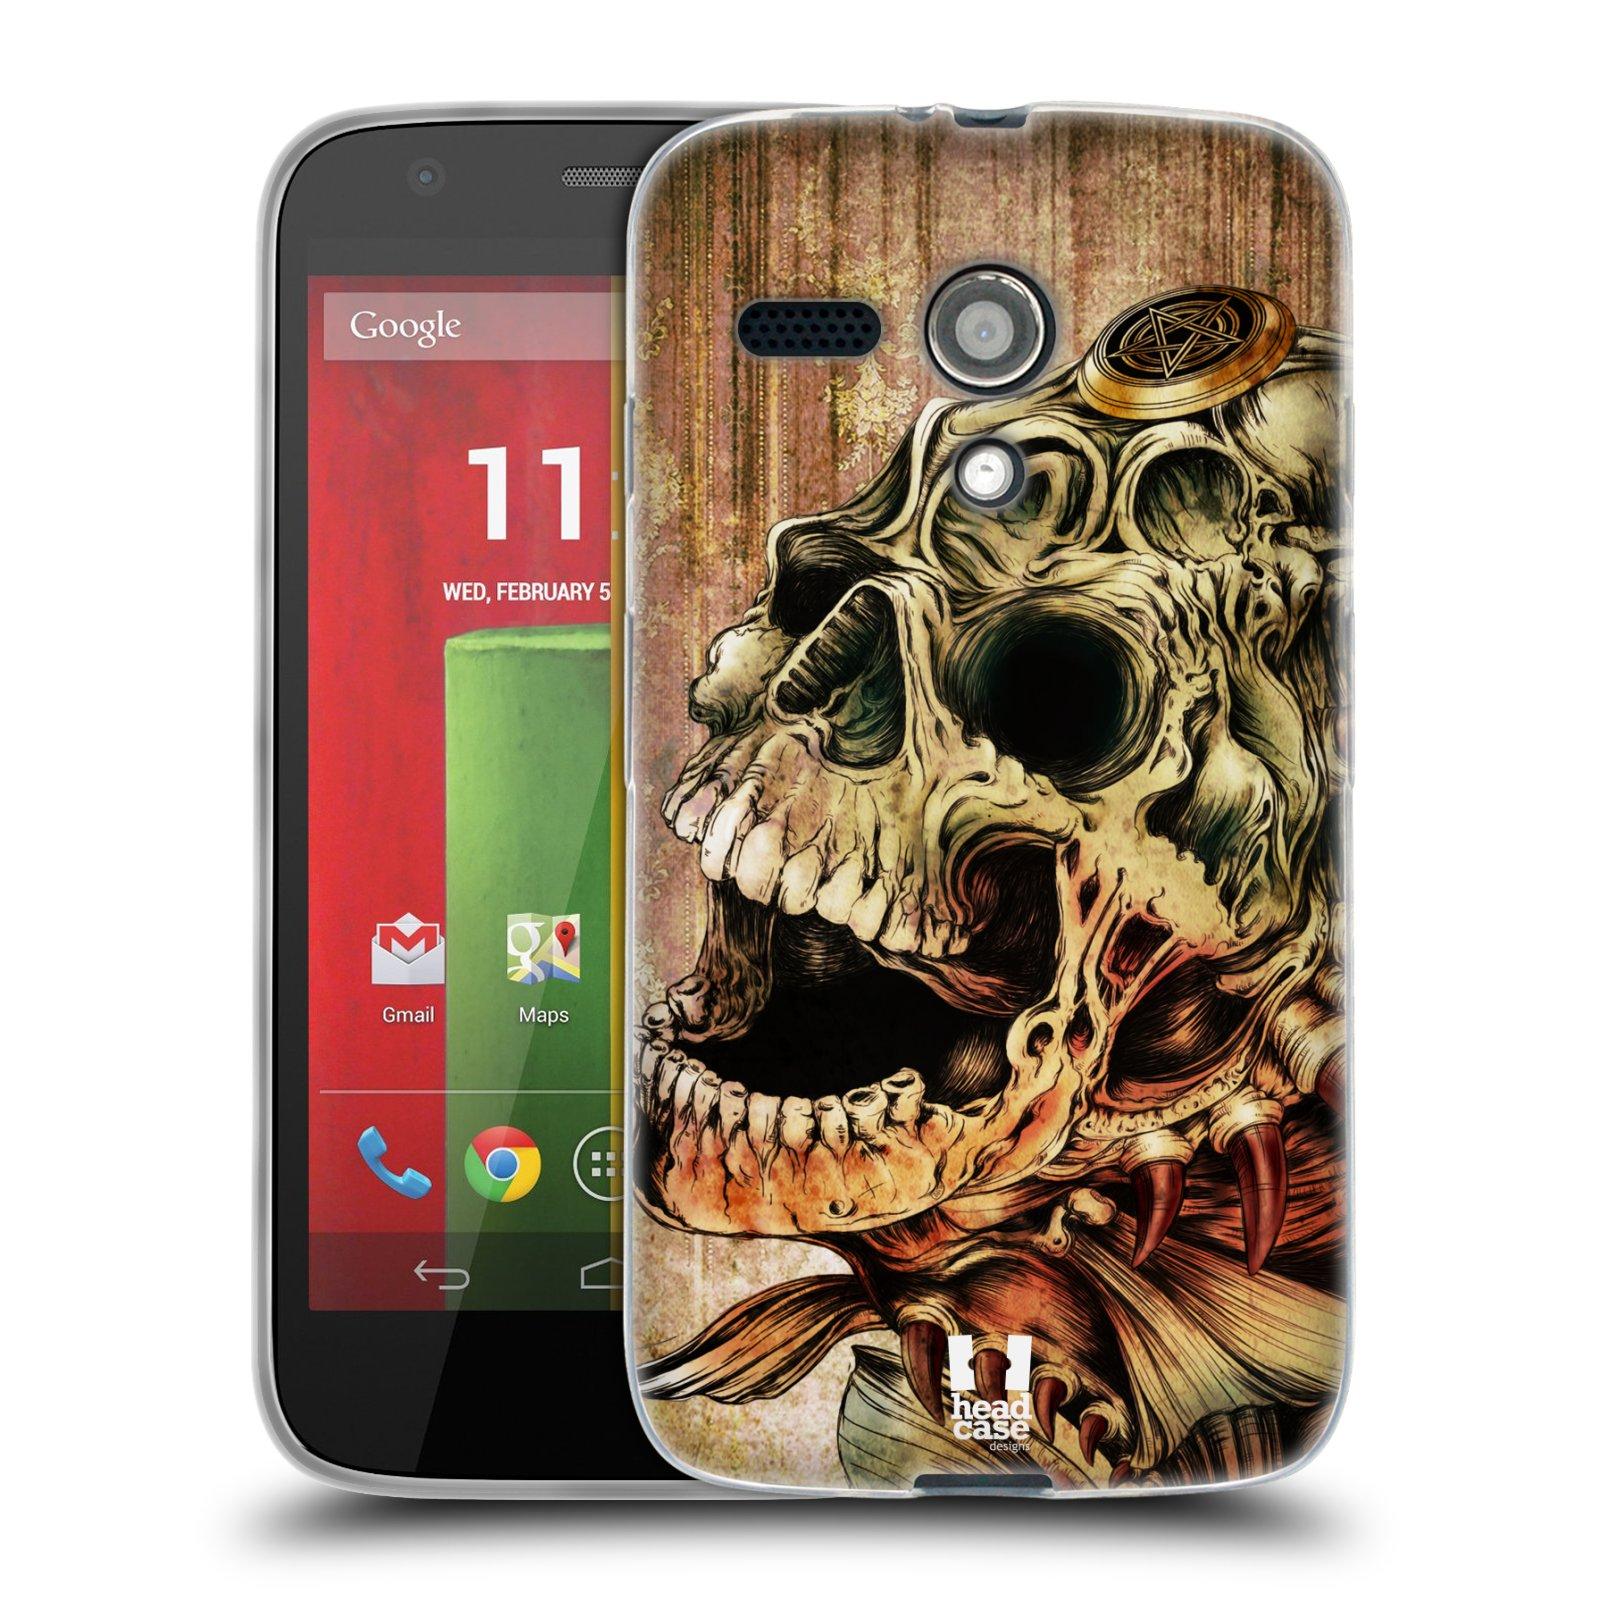 Silikonové pouzdro na mobil Motorola Moto G HEAD CASE PIRANHA (Silikonový kryt či obal na mobilní telefon Motorola Moto G)